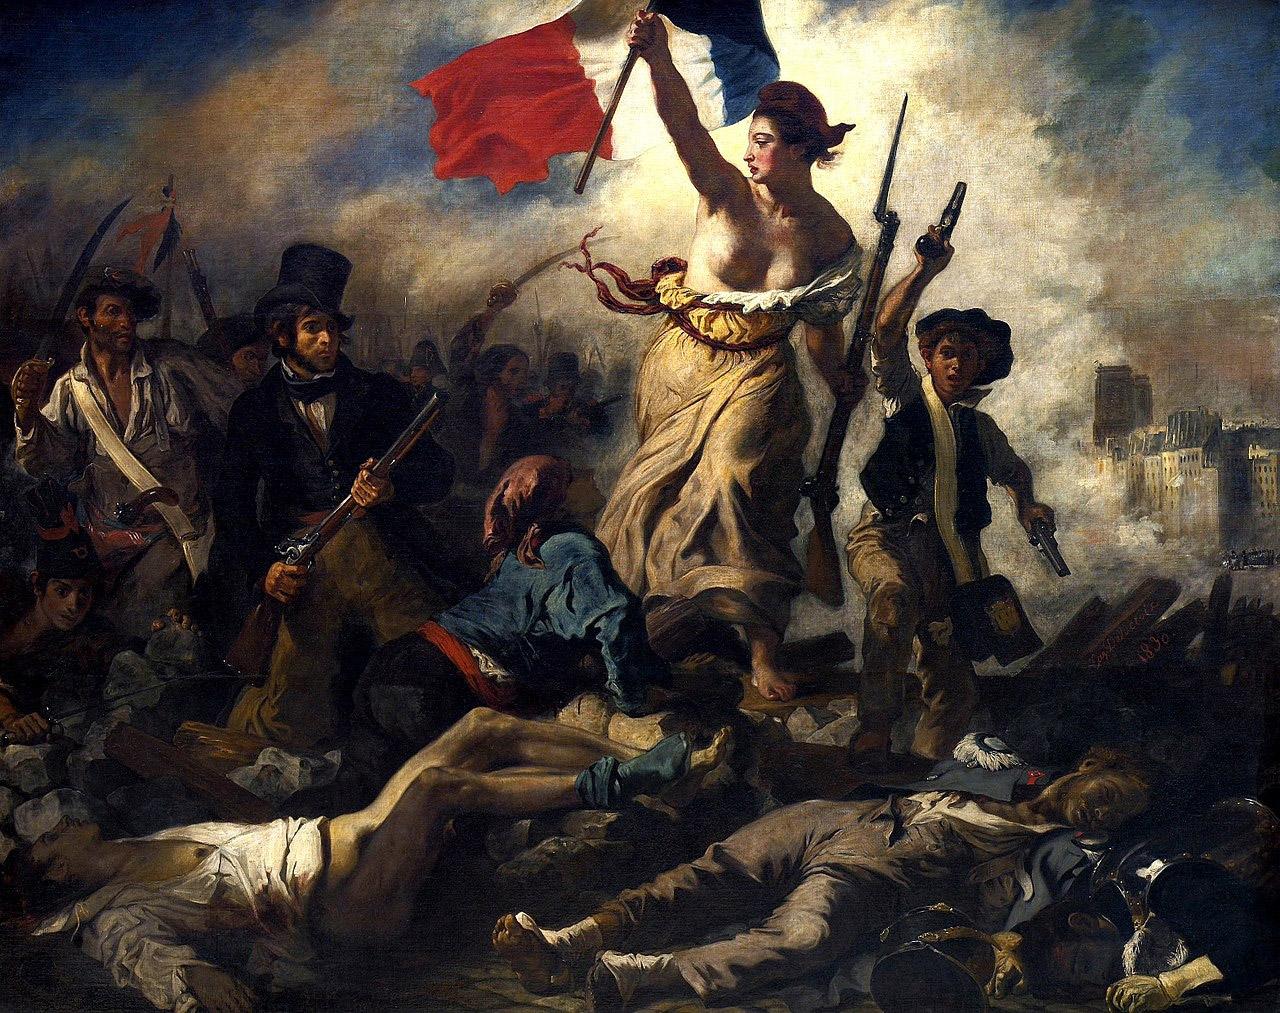 Свобода, ведущая народ. Делакруа, 1830. Холст, масло